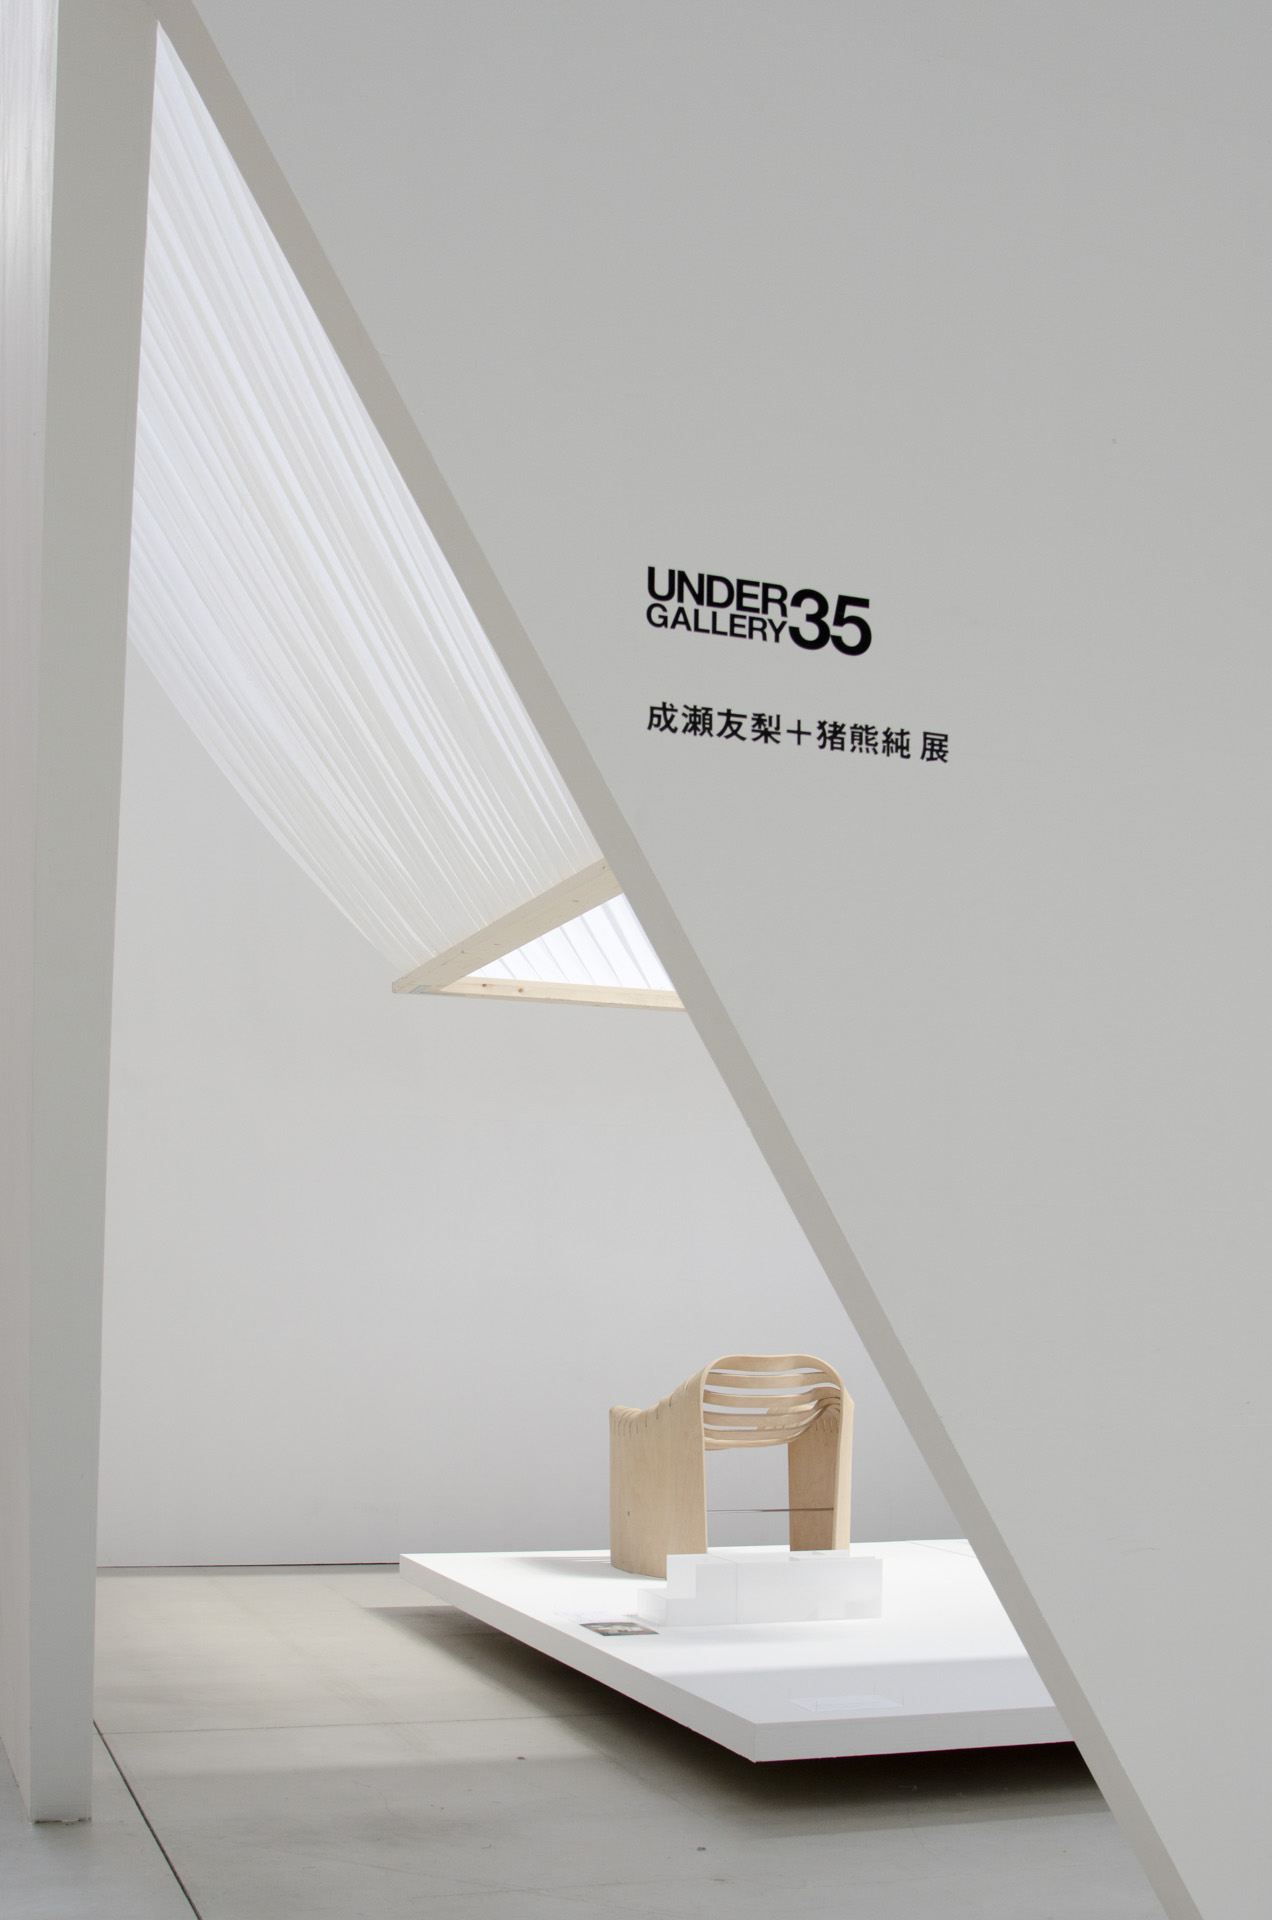 u35-1